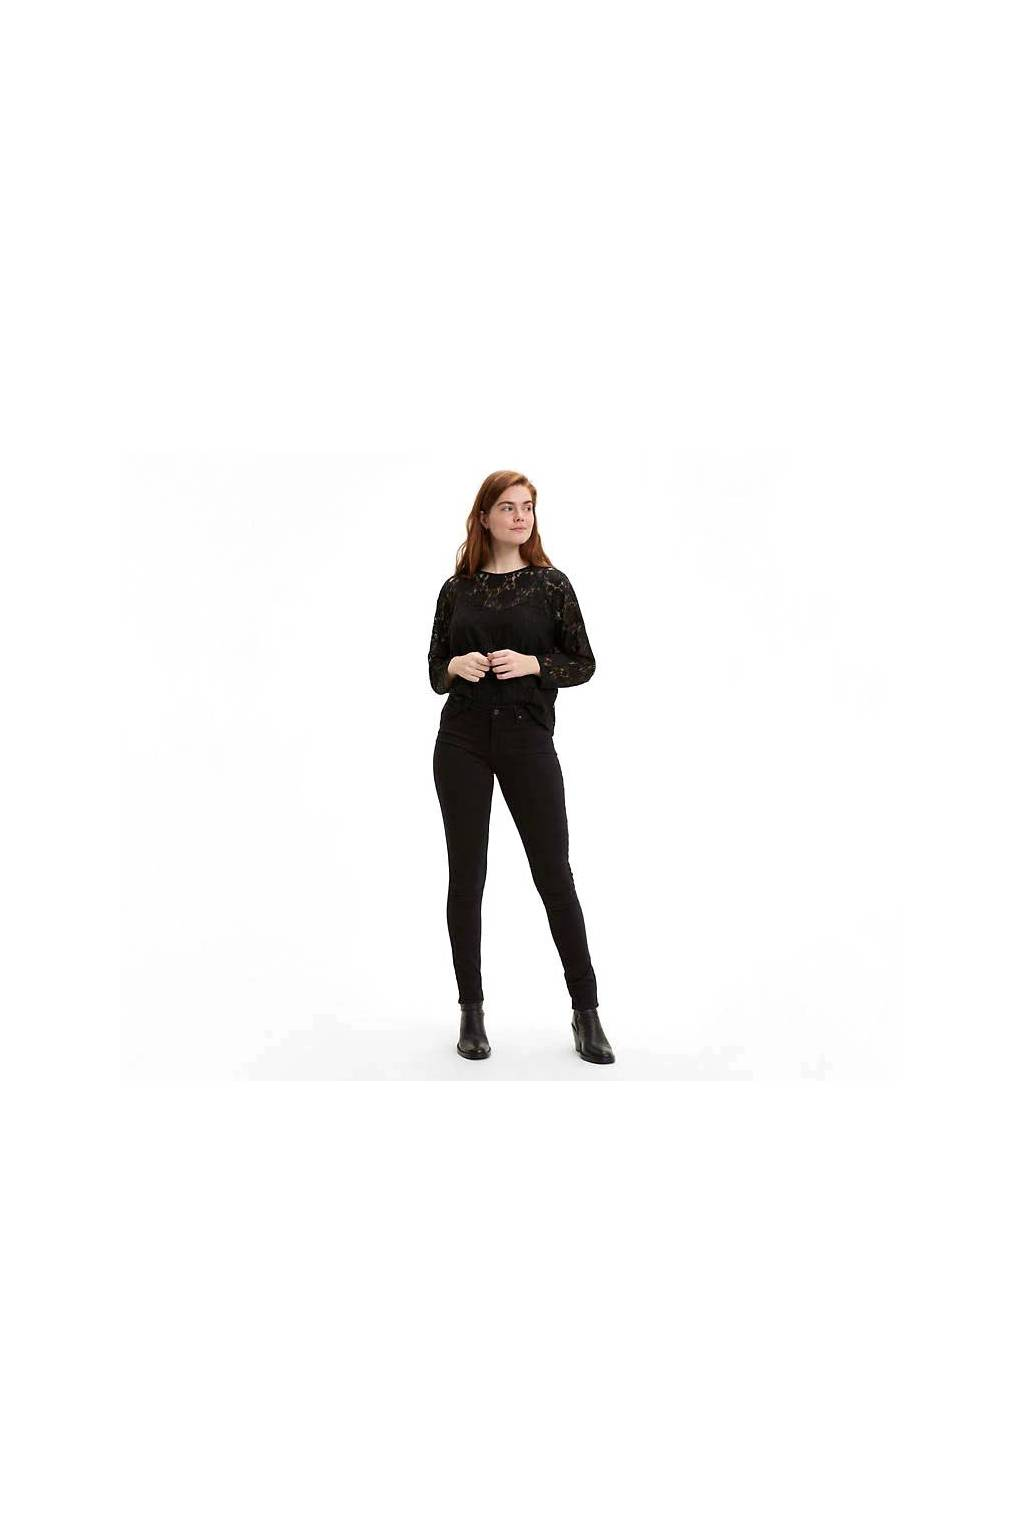 Levi 's 711 skinny jeans 18881 00 52